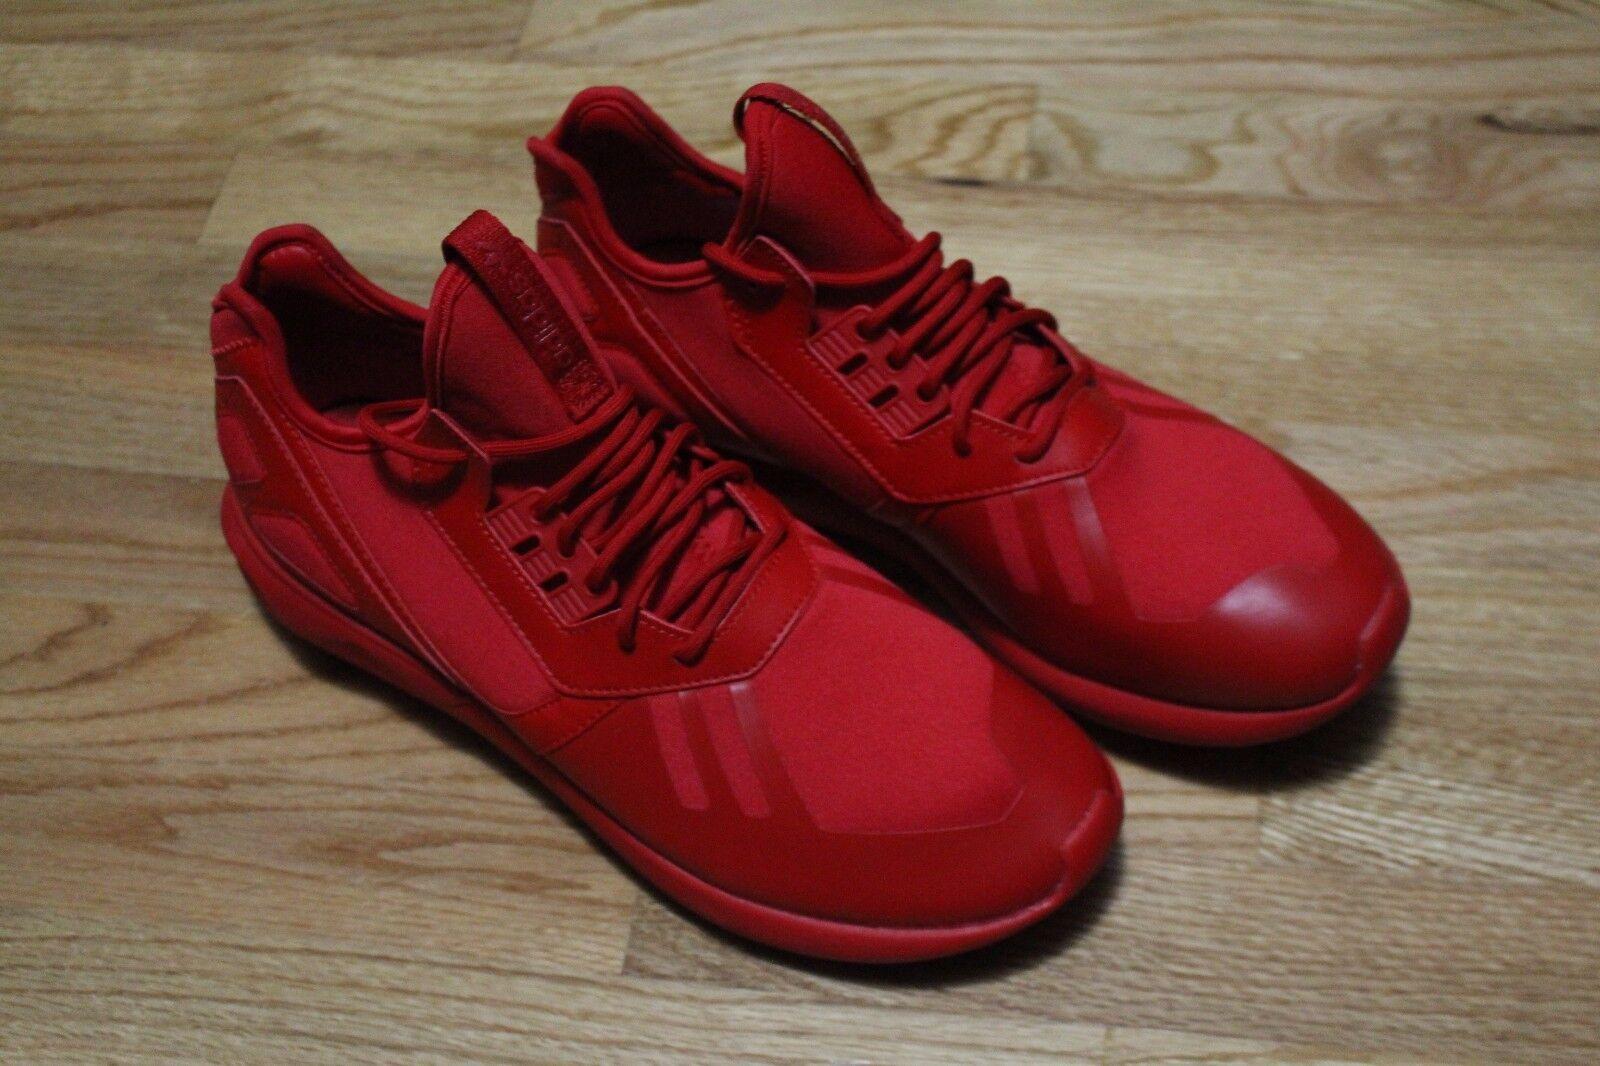 q16464 tubulaires de chaussures adidas adidas adidas originaux rouge nous taille 10,5 729cb6